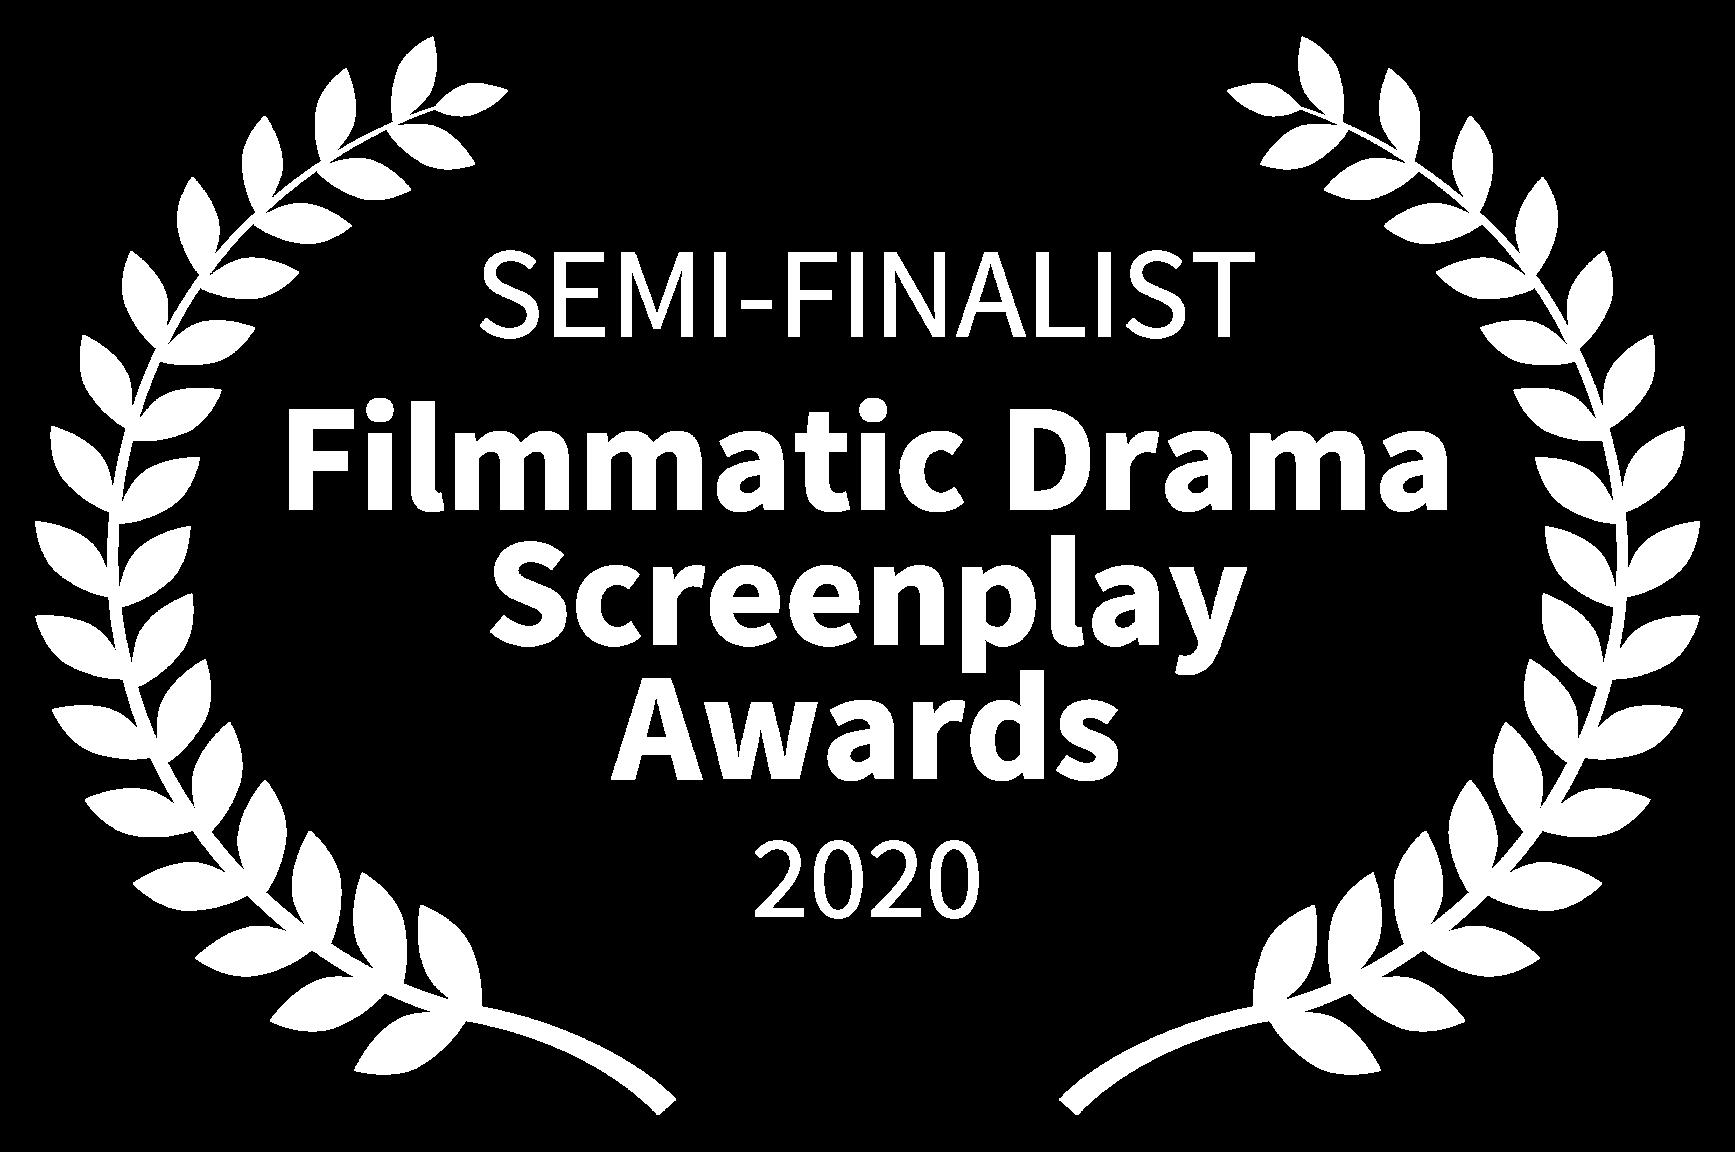 SEMI-FINALIST - Filmmatic Drama Screenplay Awards - 2020